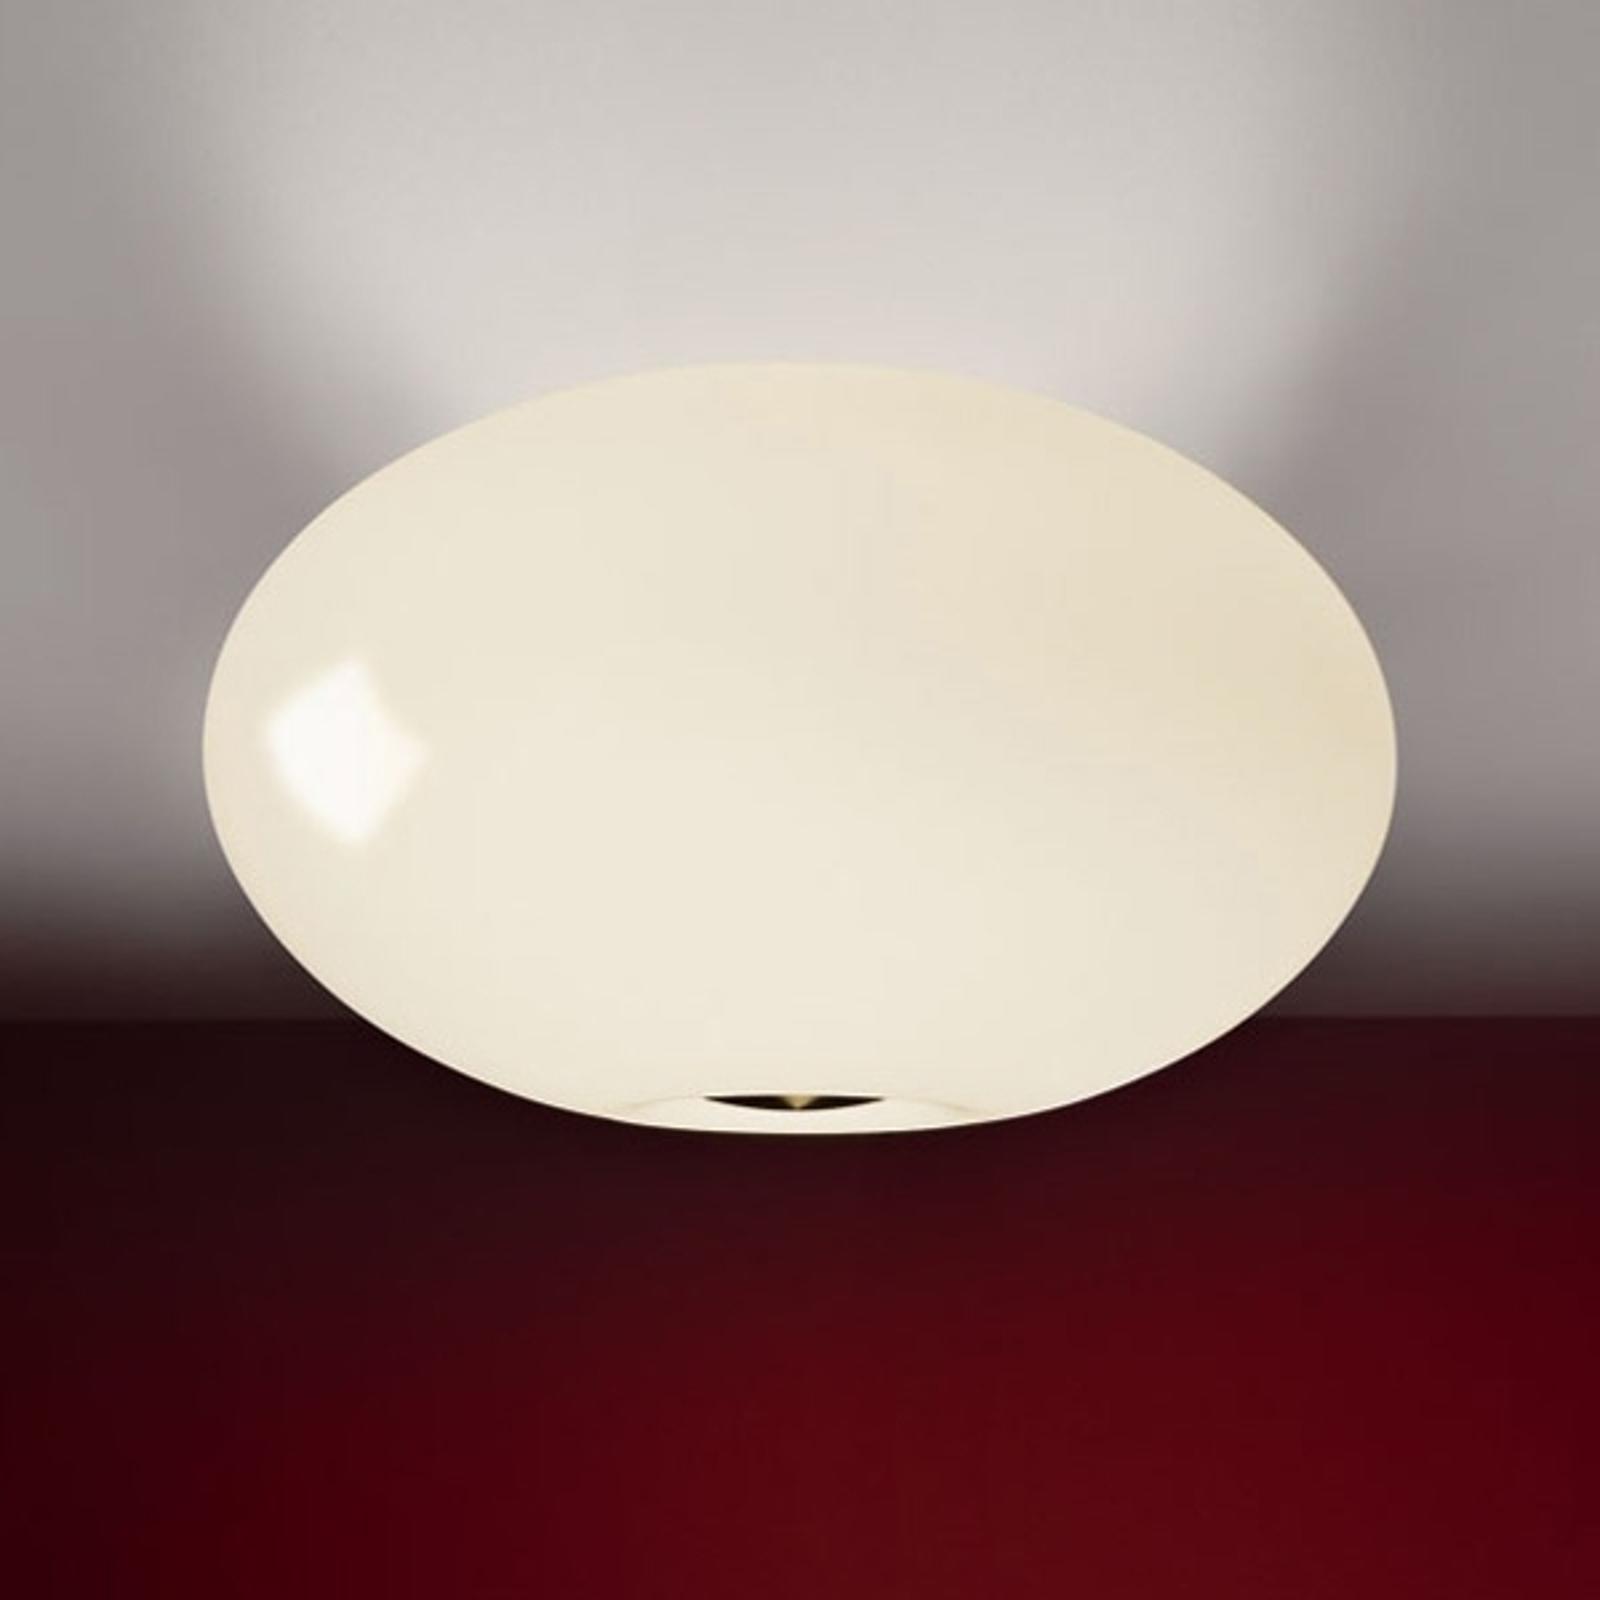 Fraaie plafondlamp AIH, 38 cm, crème glanzend